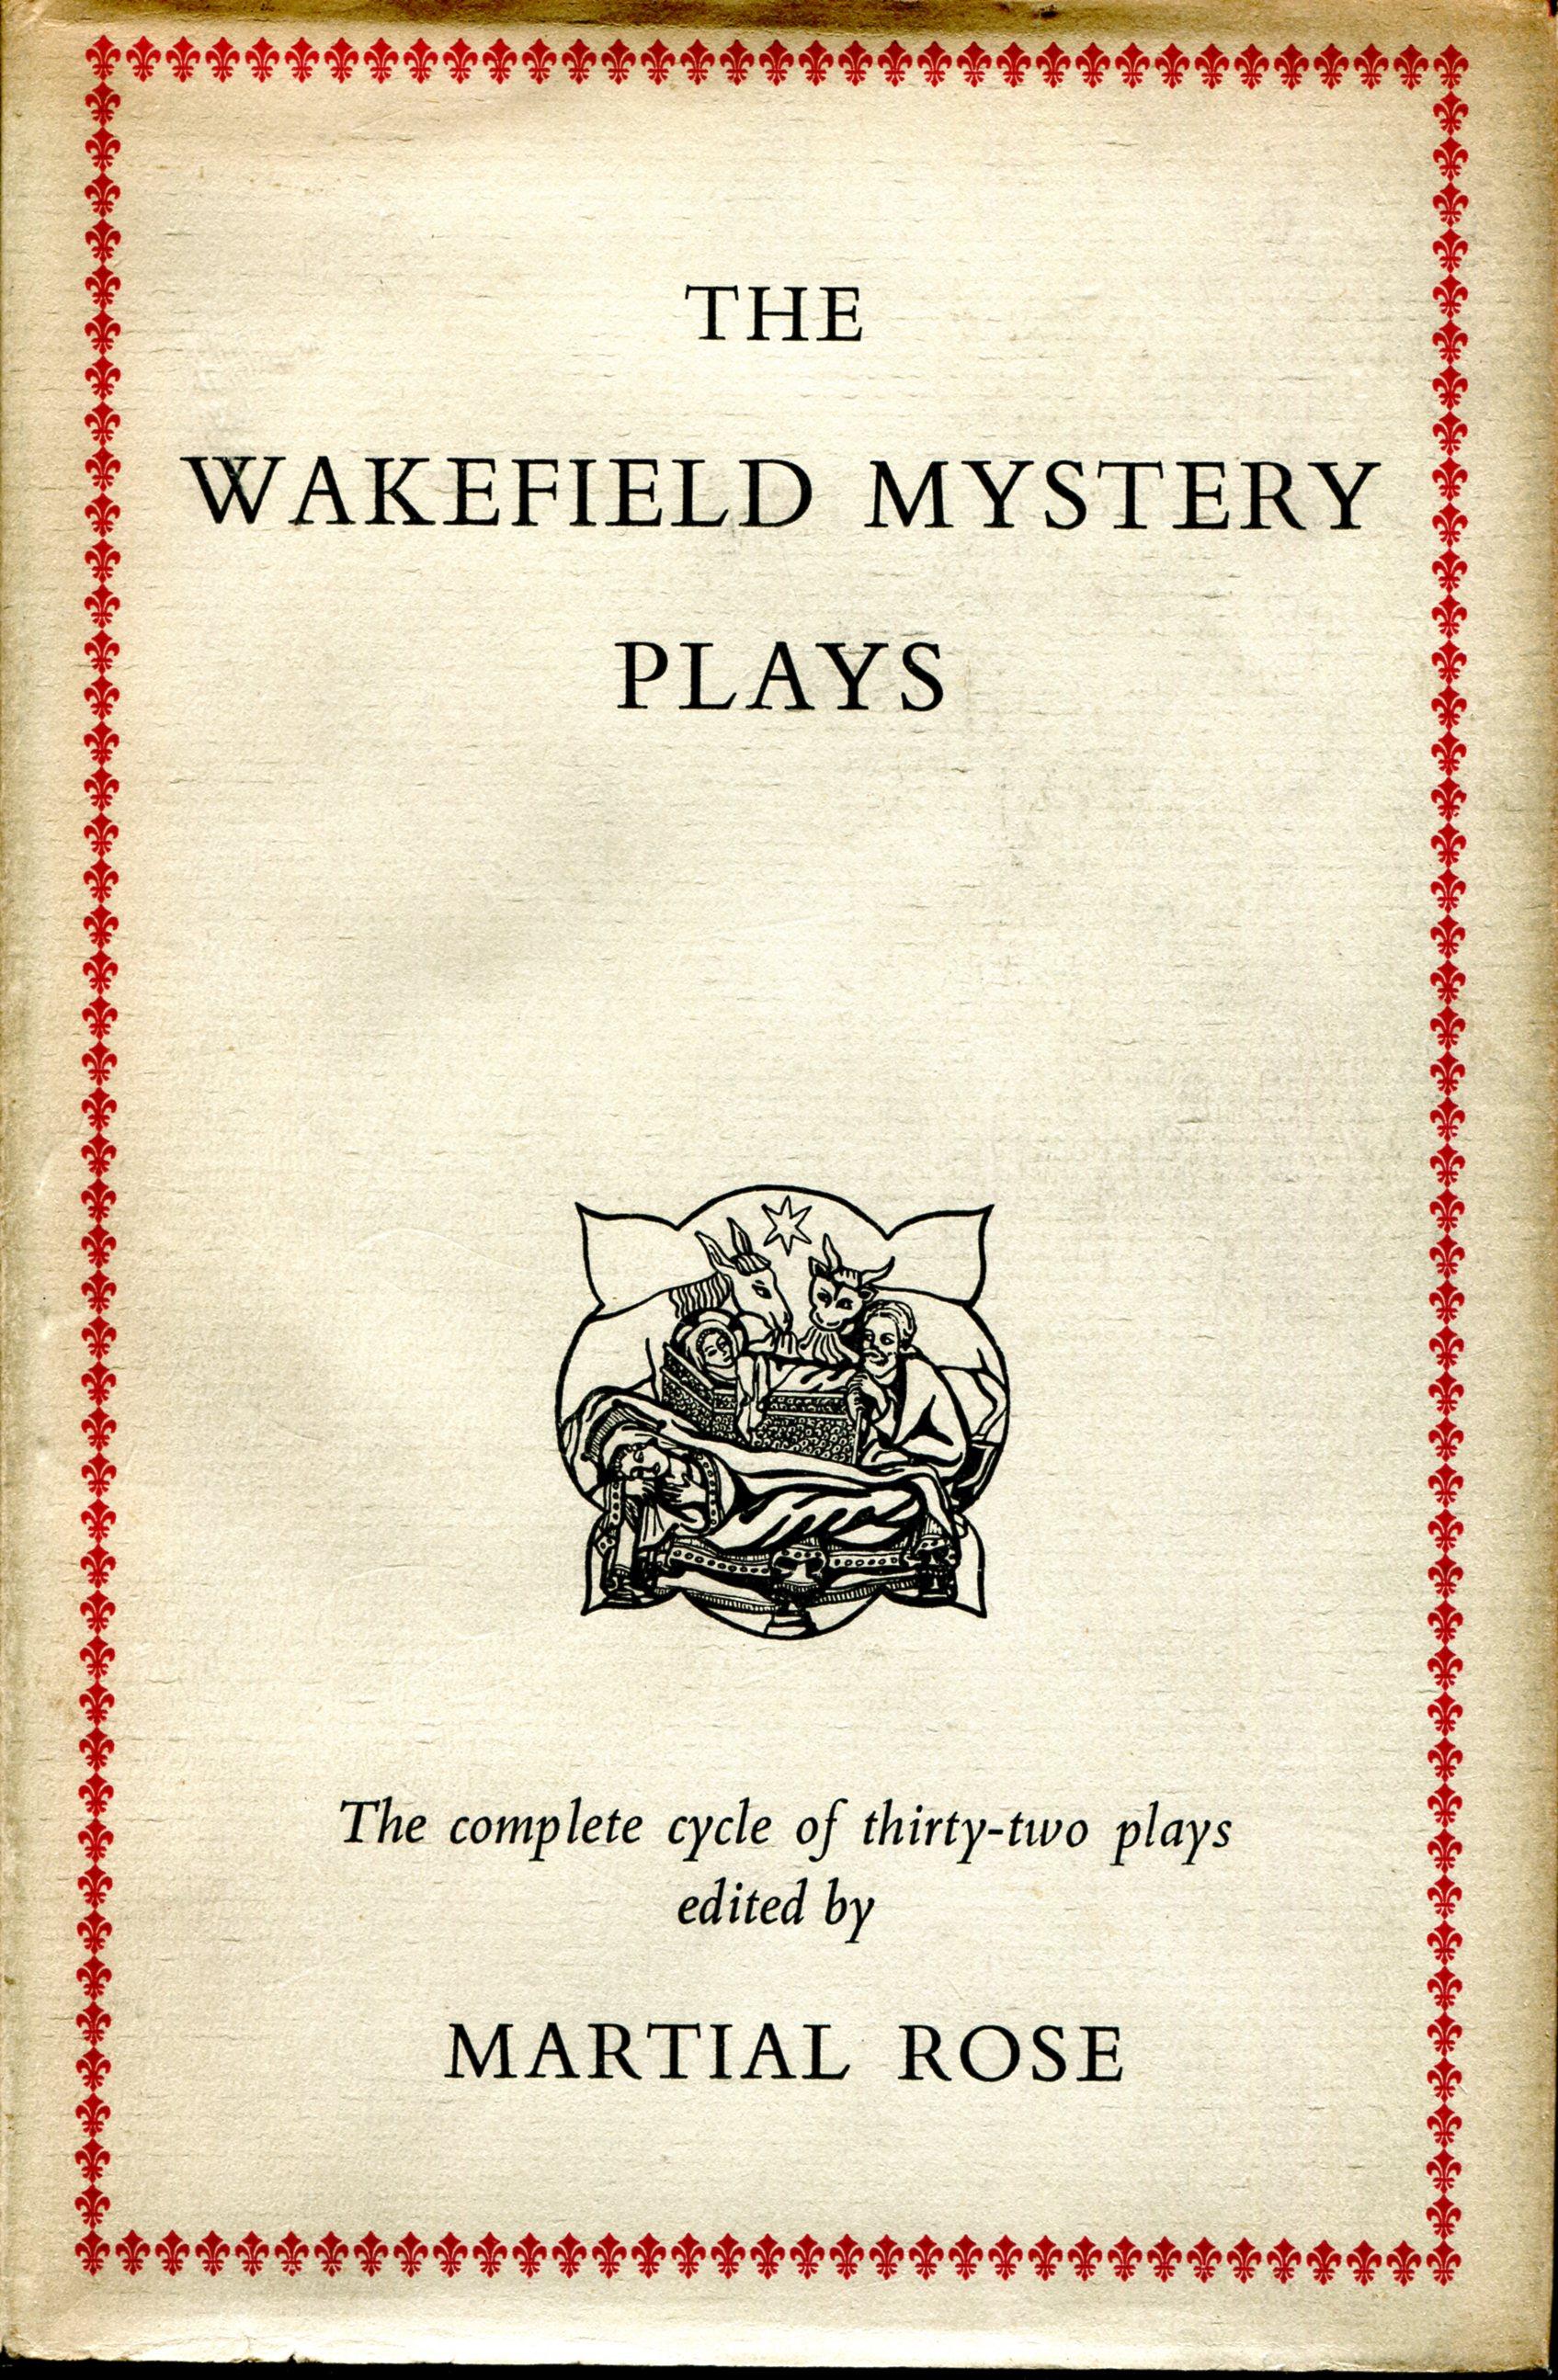 Wakefield Plays120